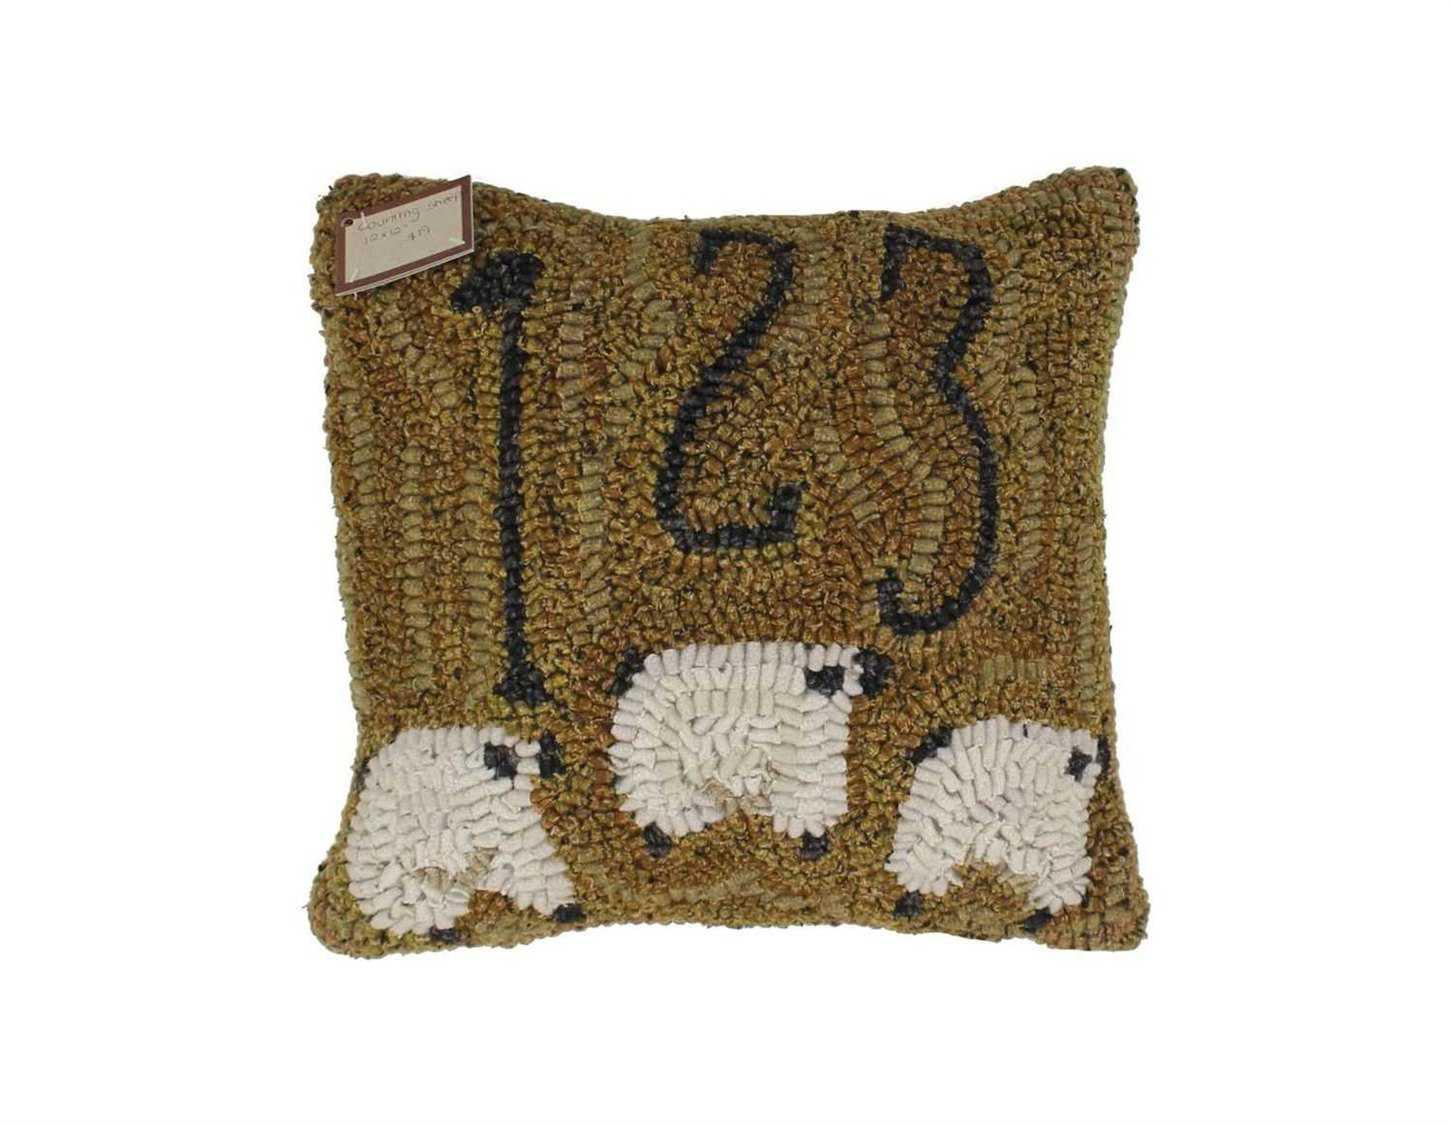 Homespice Decor Counting Sheep Pillow